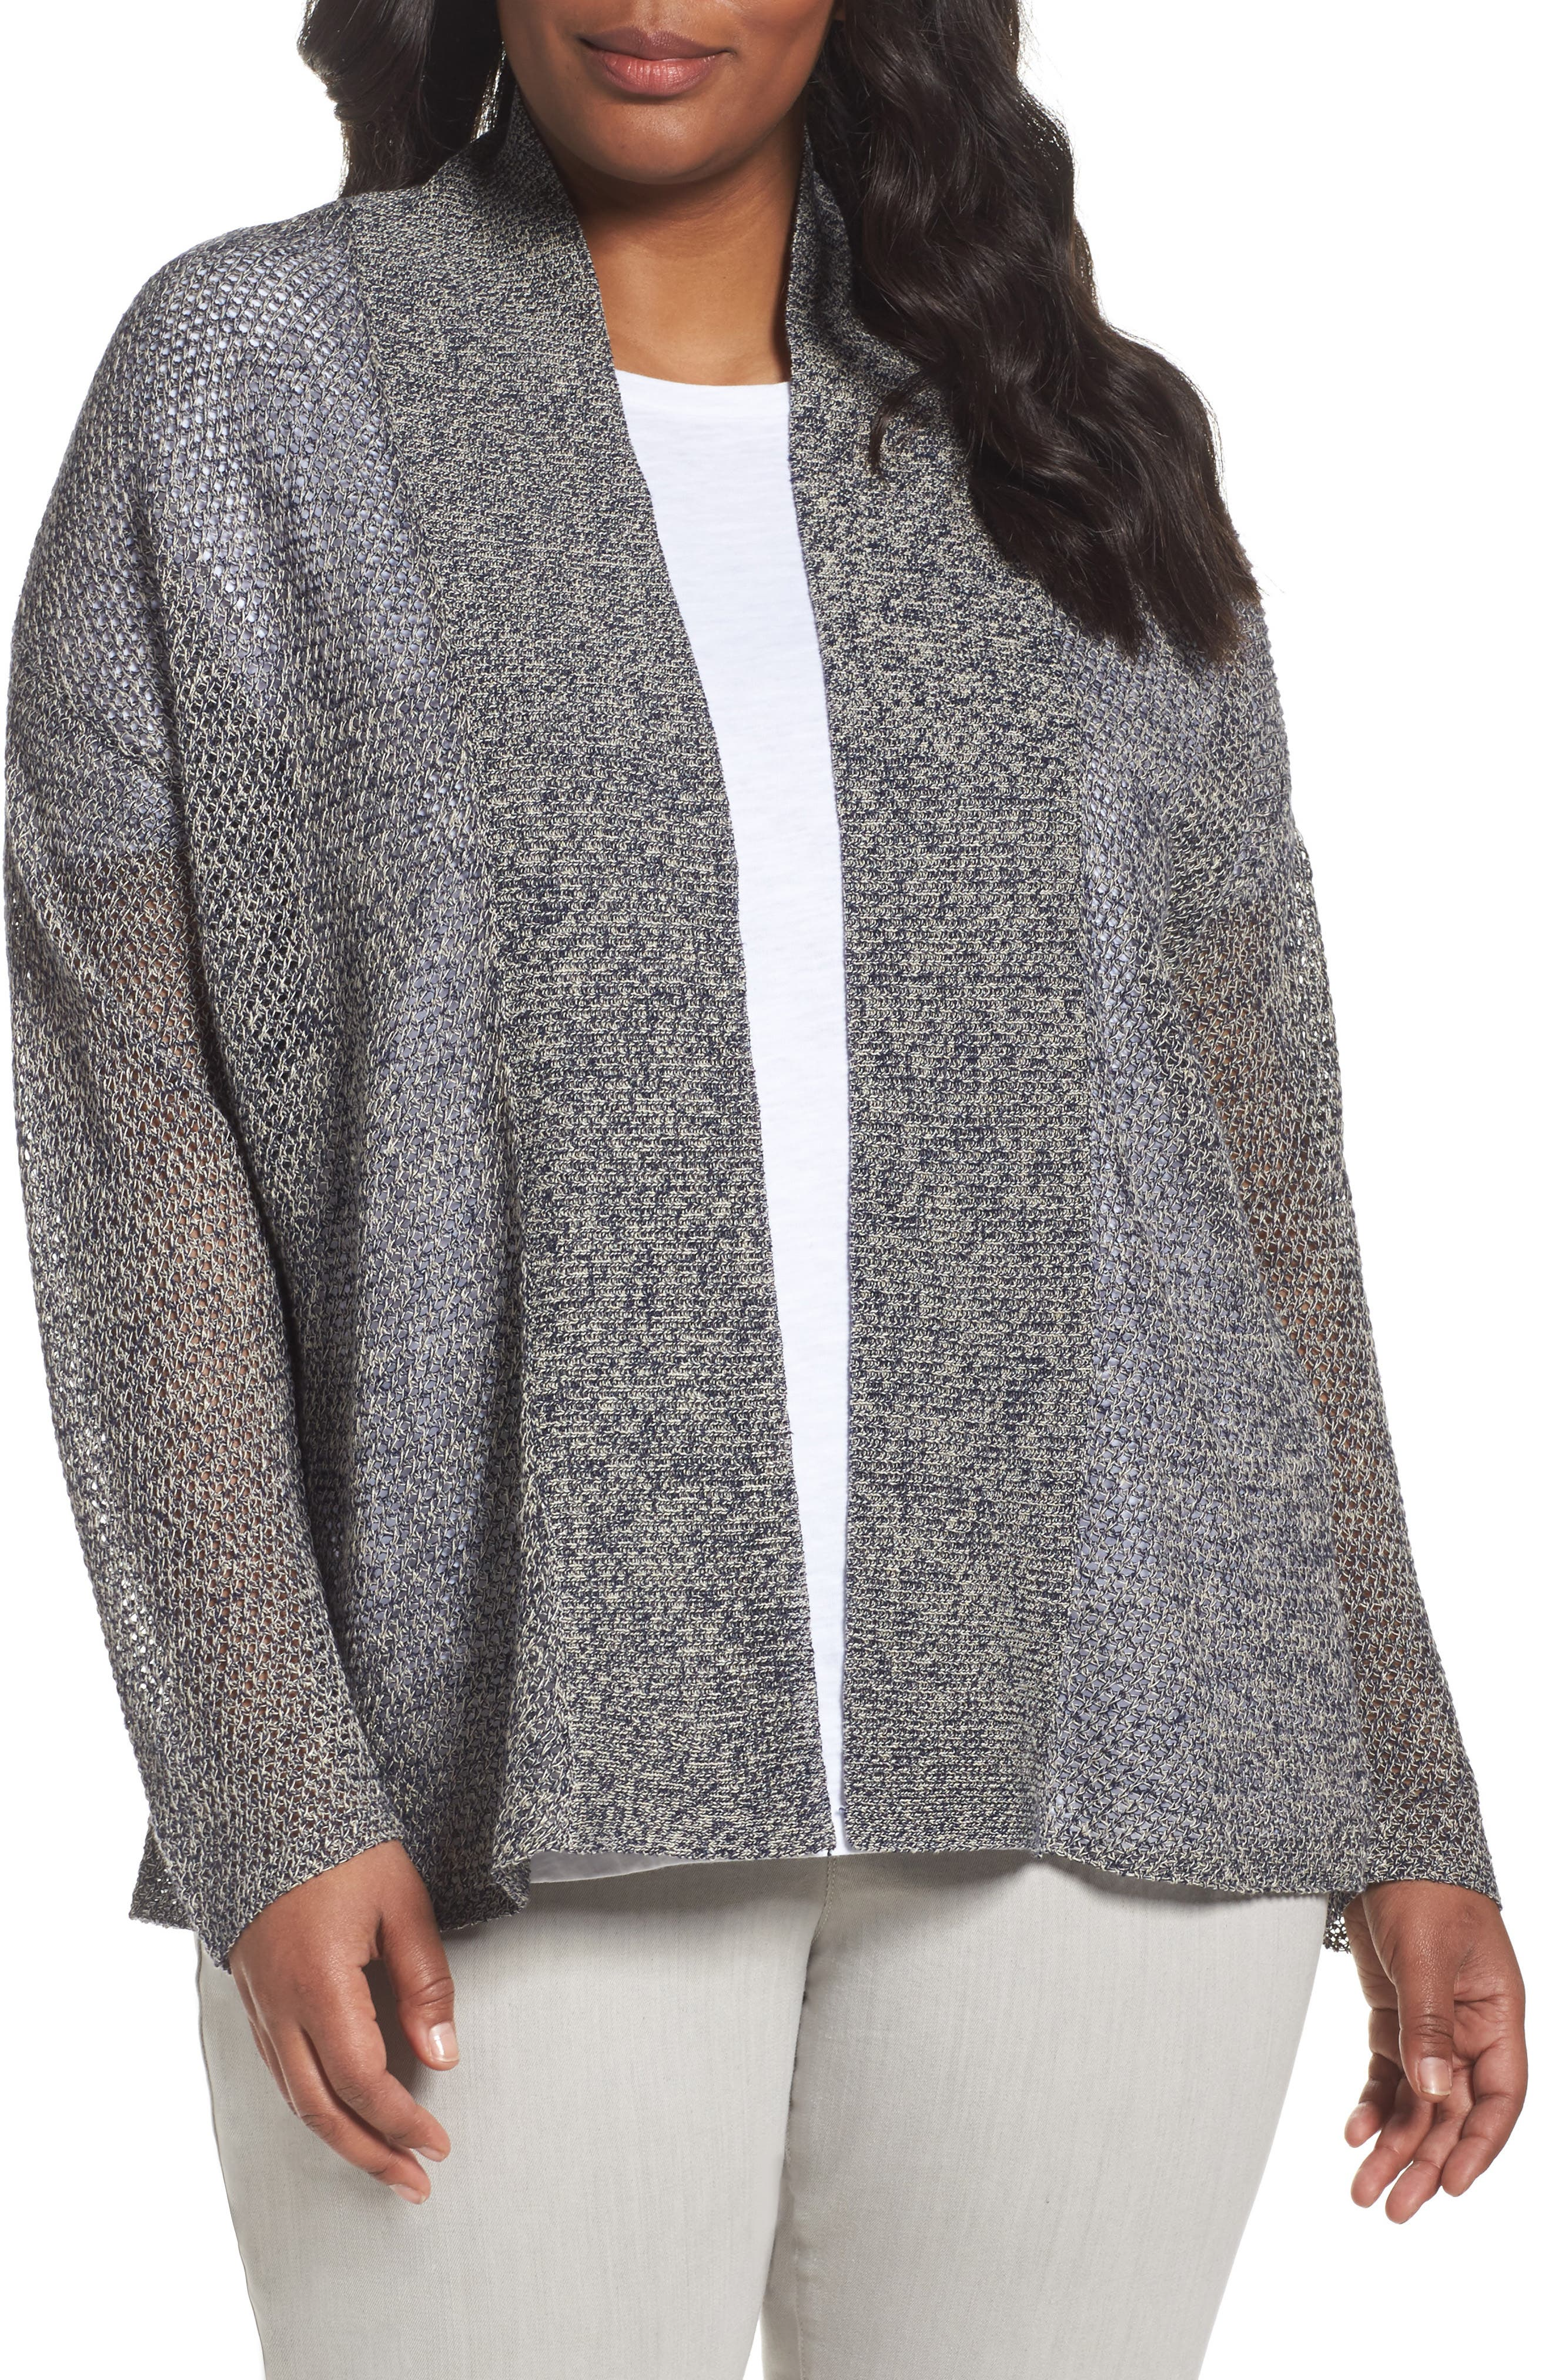 Eileen Fisher Boxy Organic Linen Cardigan (Plus Size)